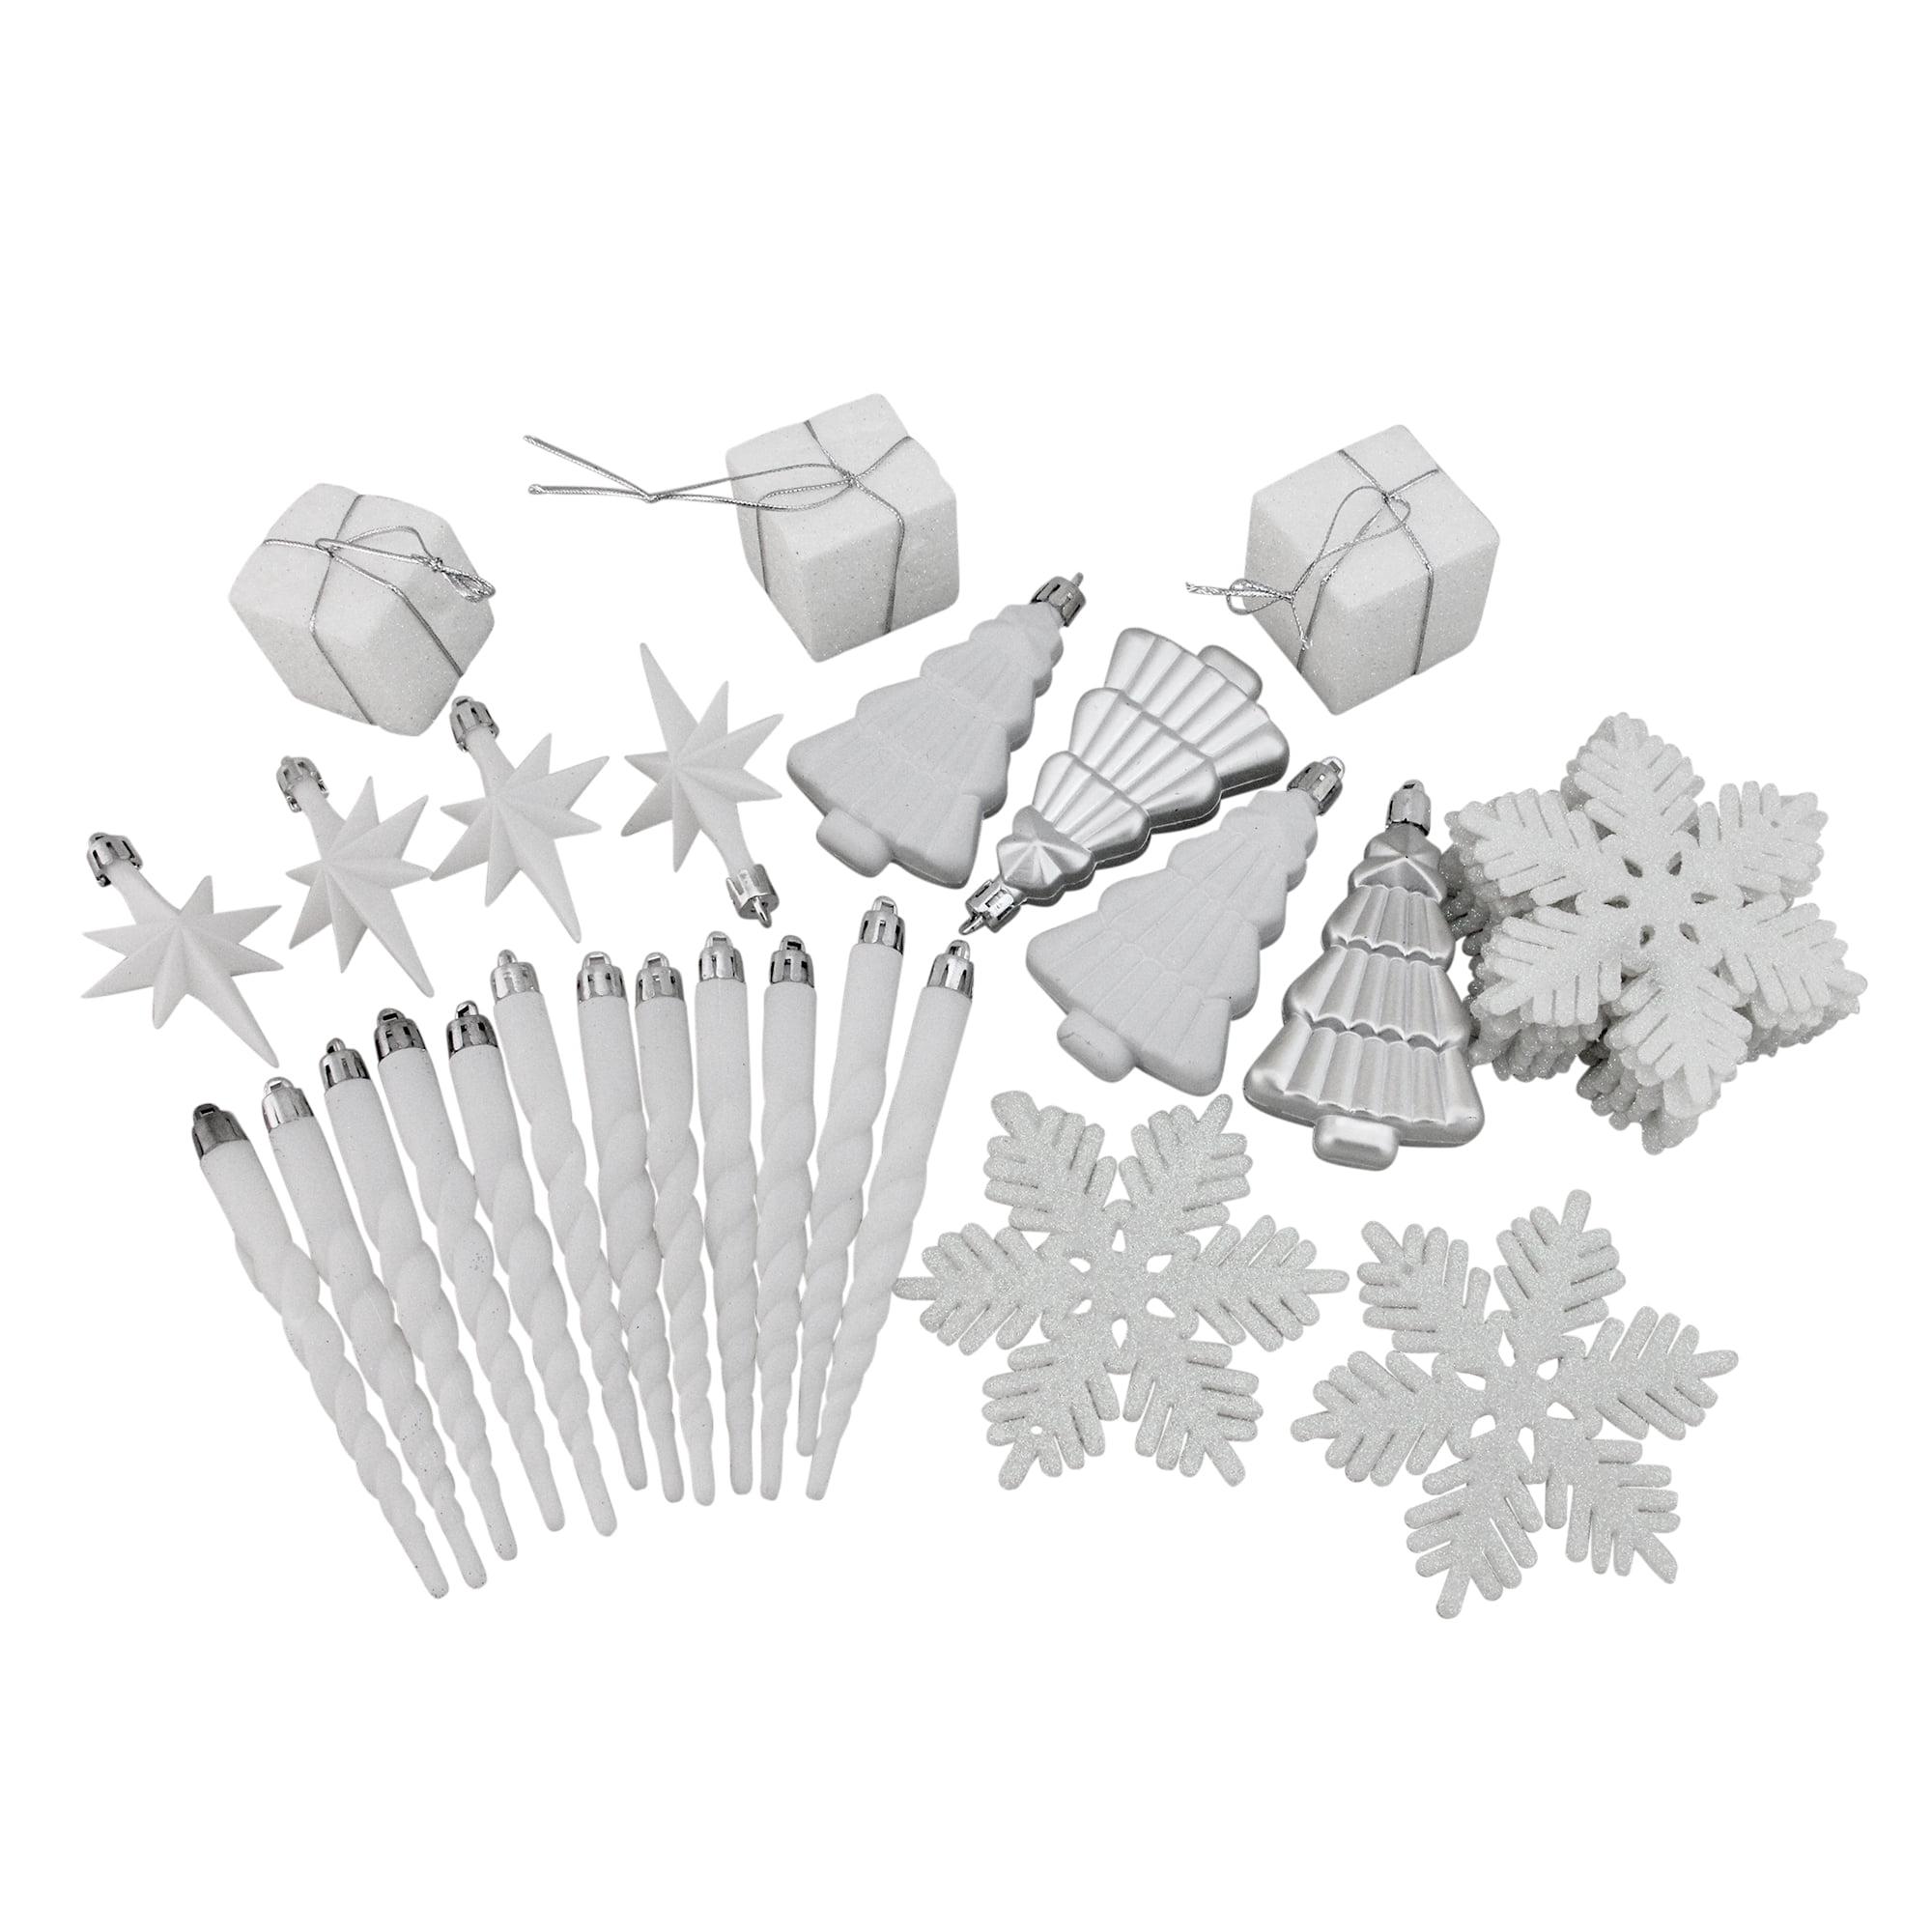 125ct Winter White and Silver Splendor Shatterproof 4-Finish Christmas Ornaments